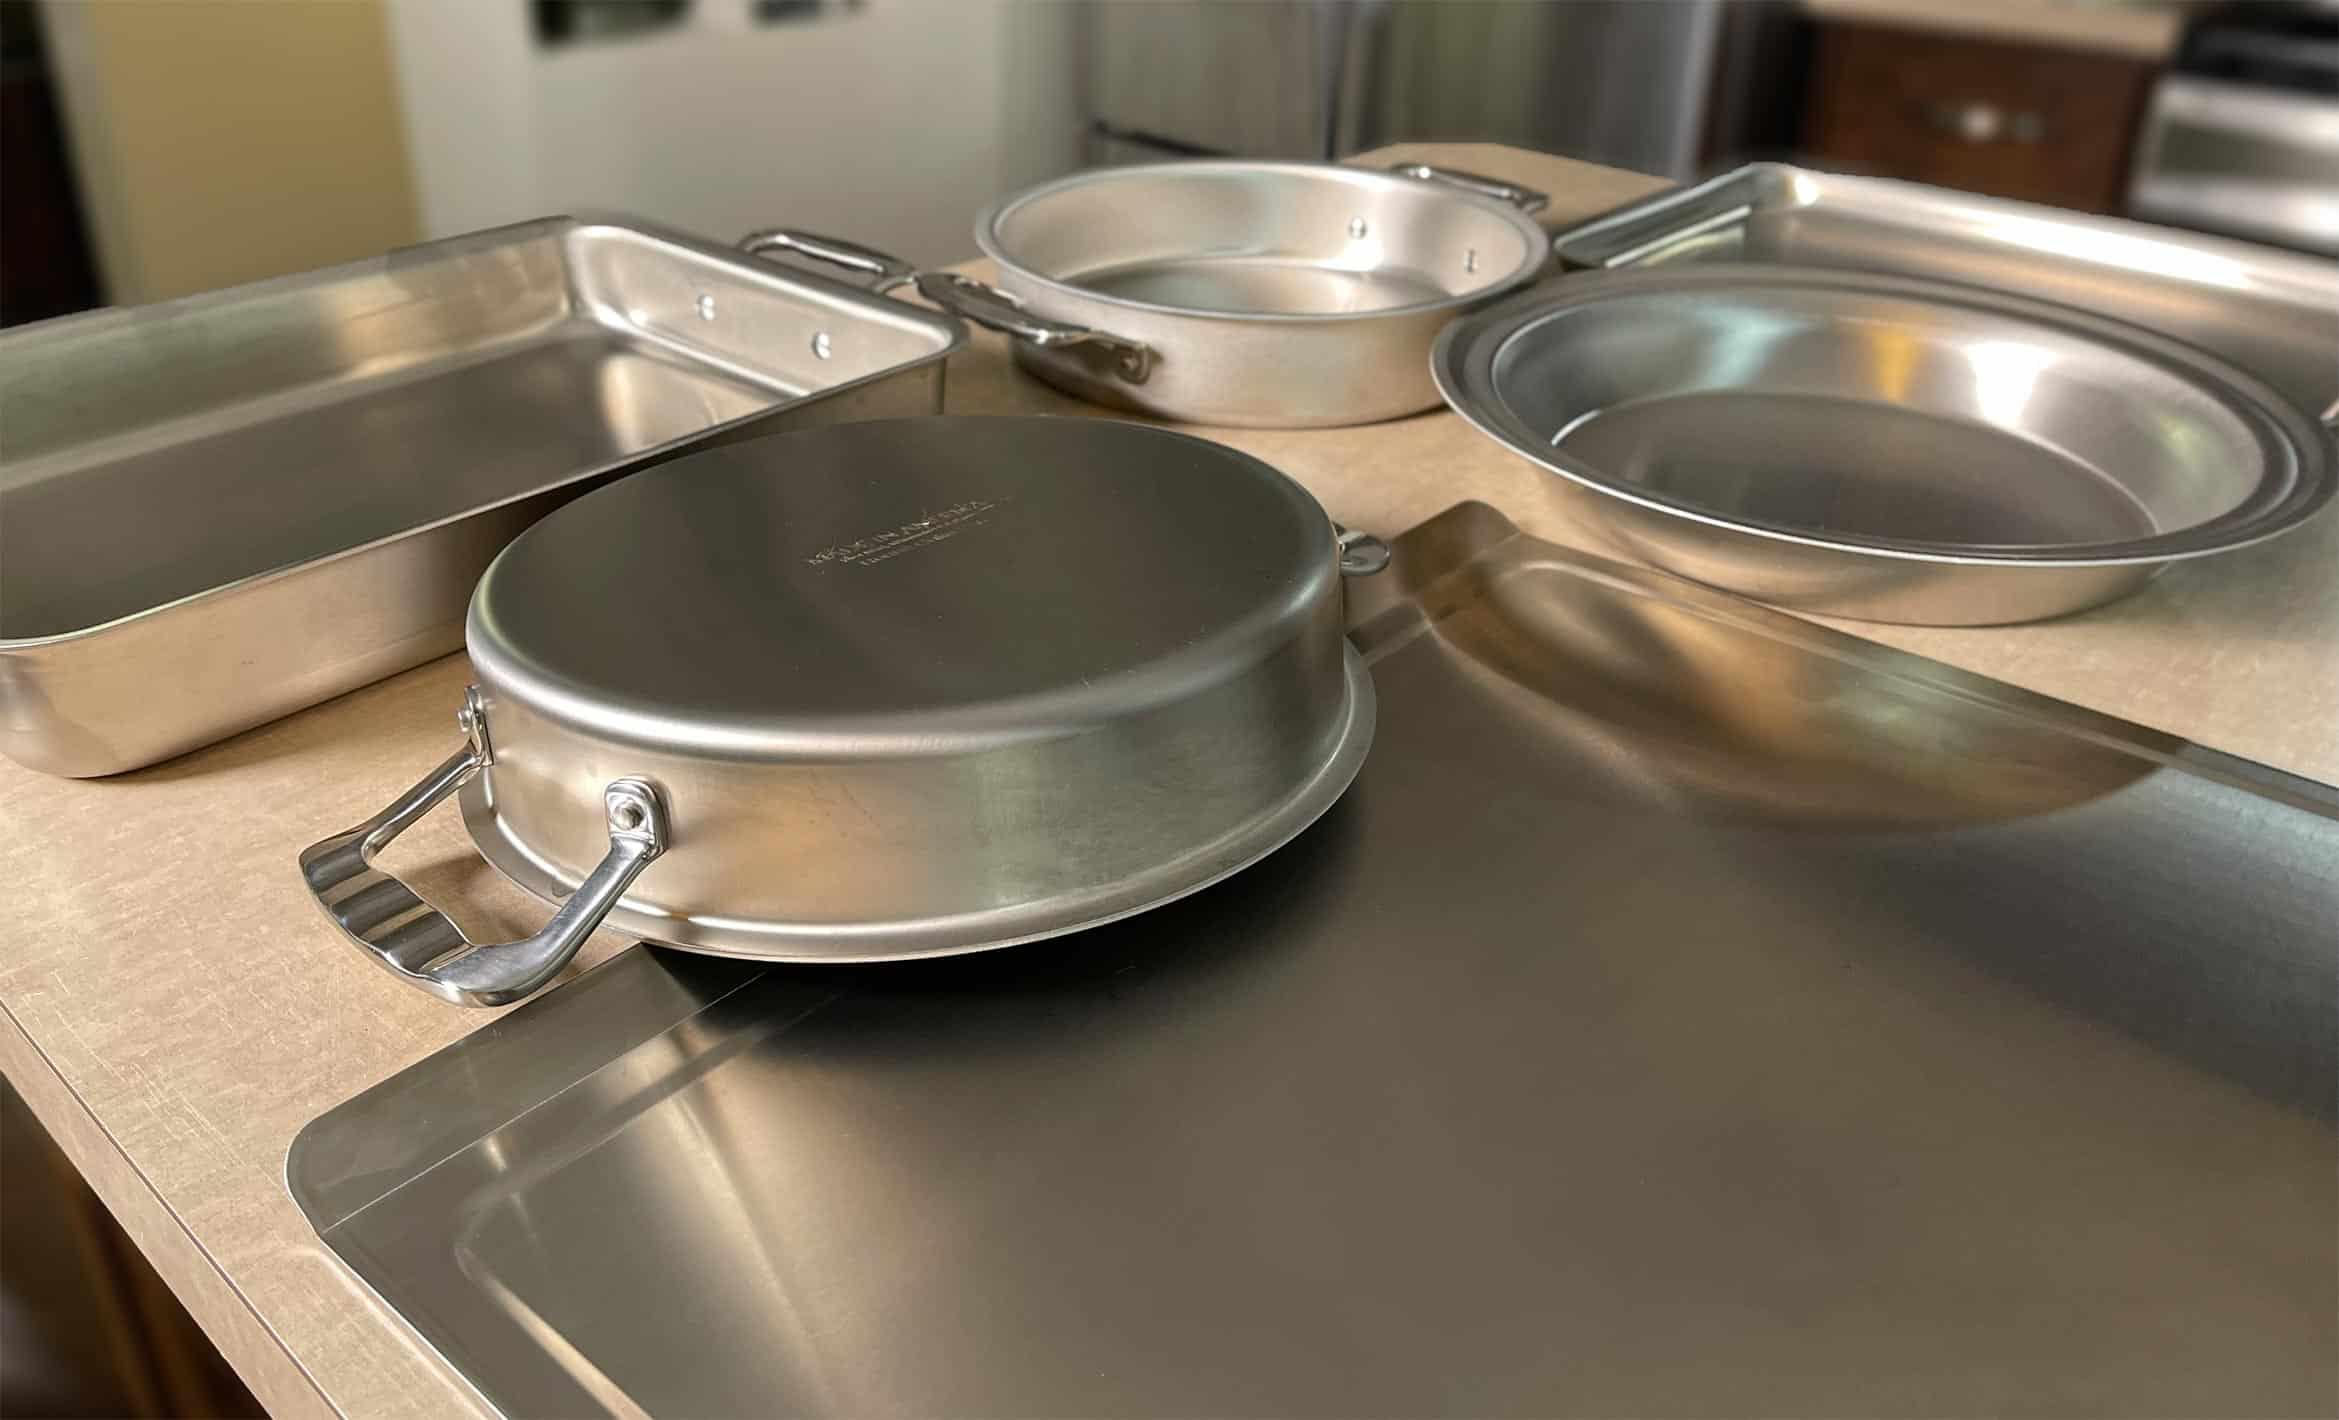 Best 5-Ply Bakeware - Like Triply but better!